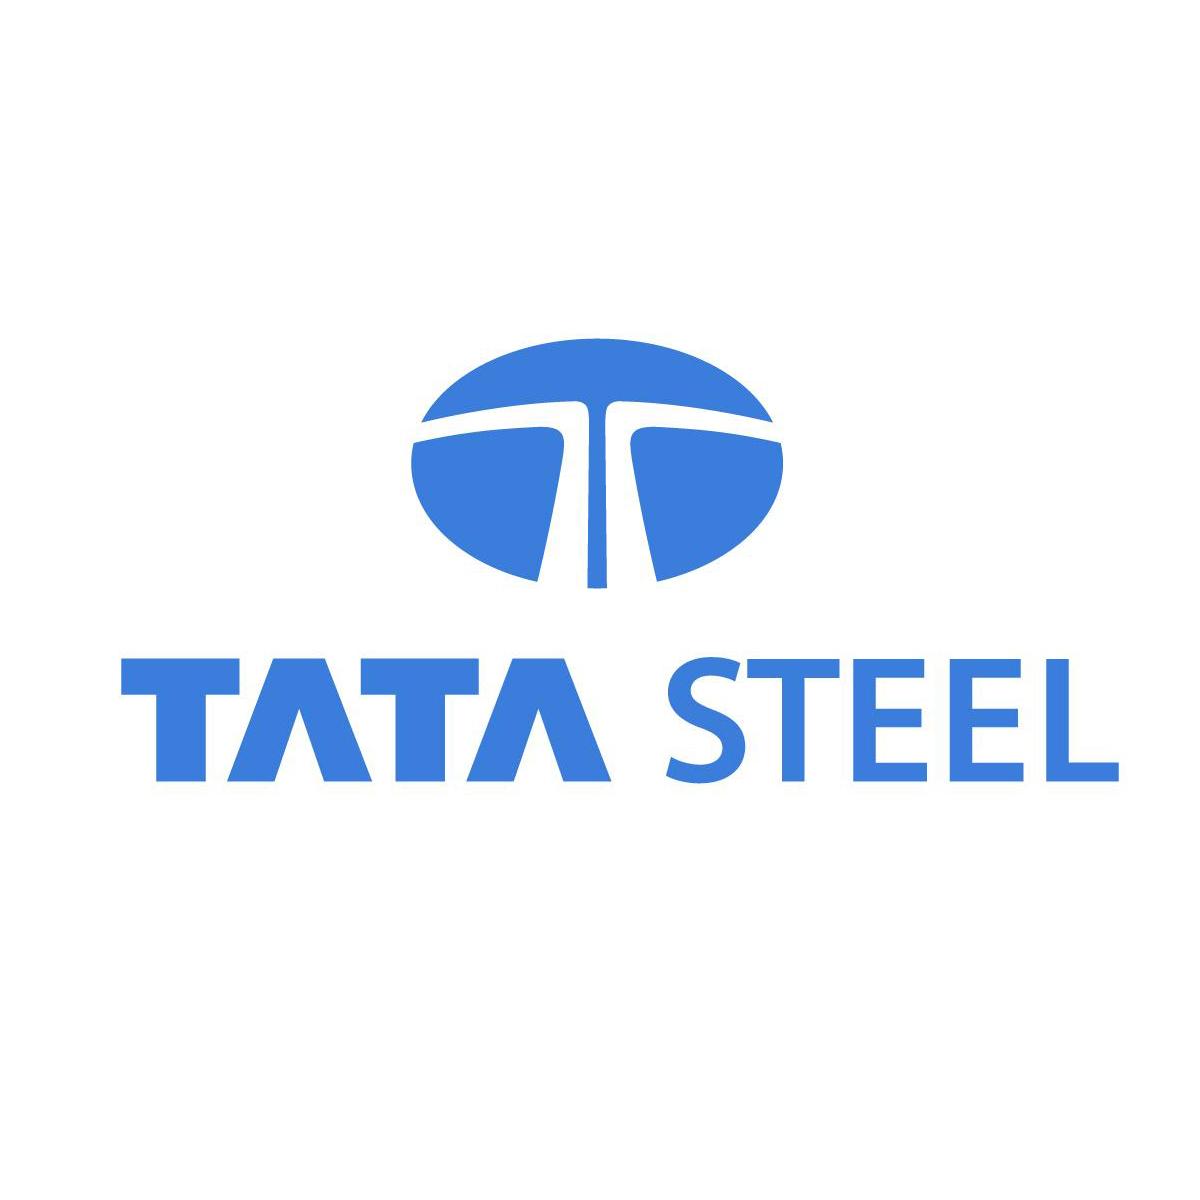 L'usine Tata Steel de Hayange en vente : les salariés sont inquiets